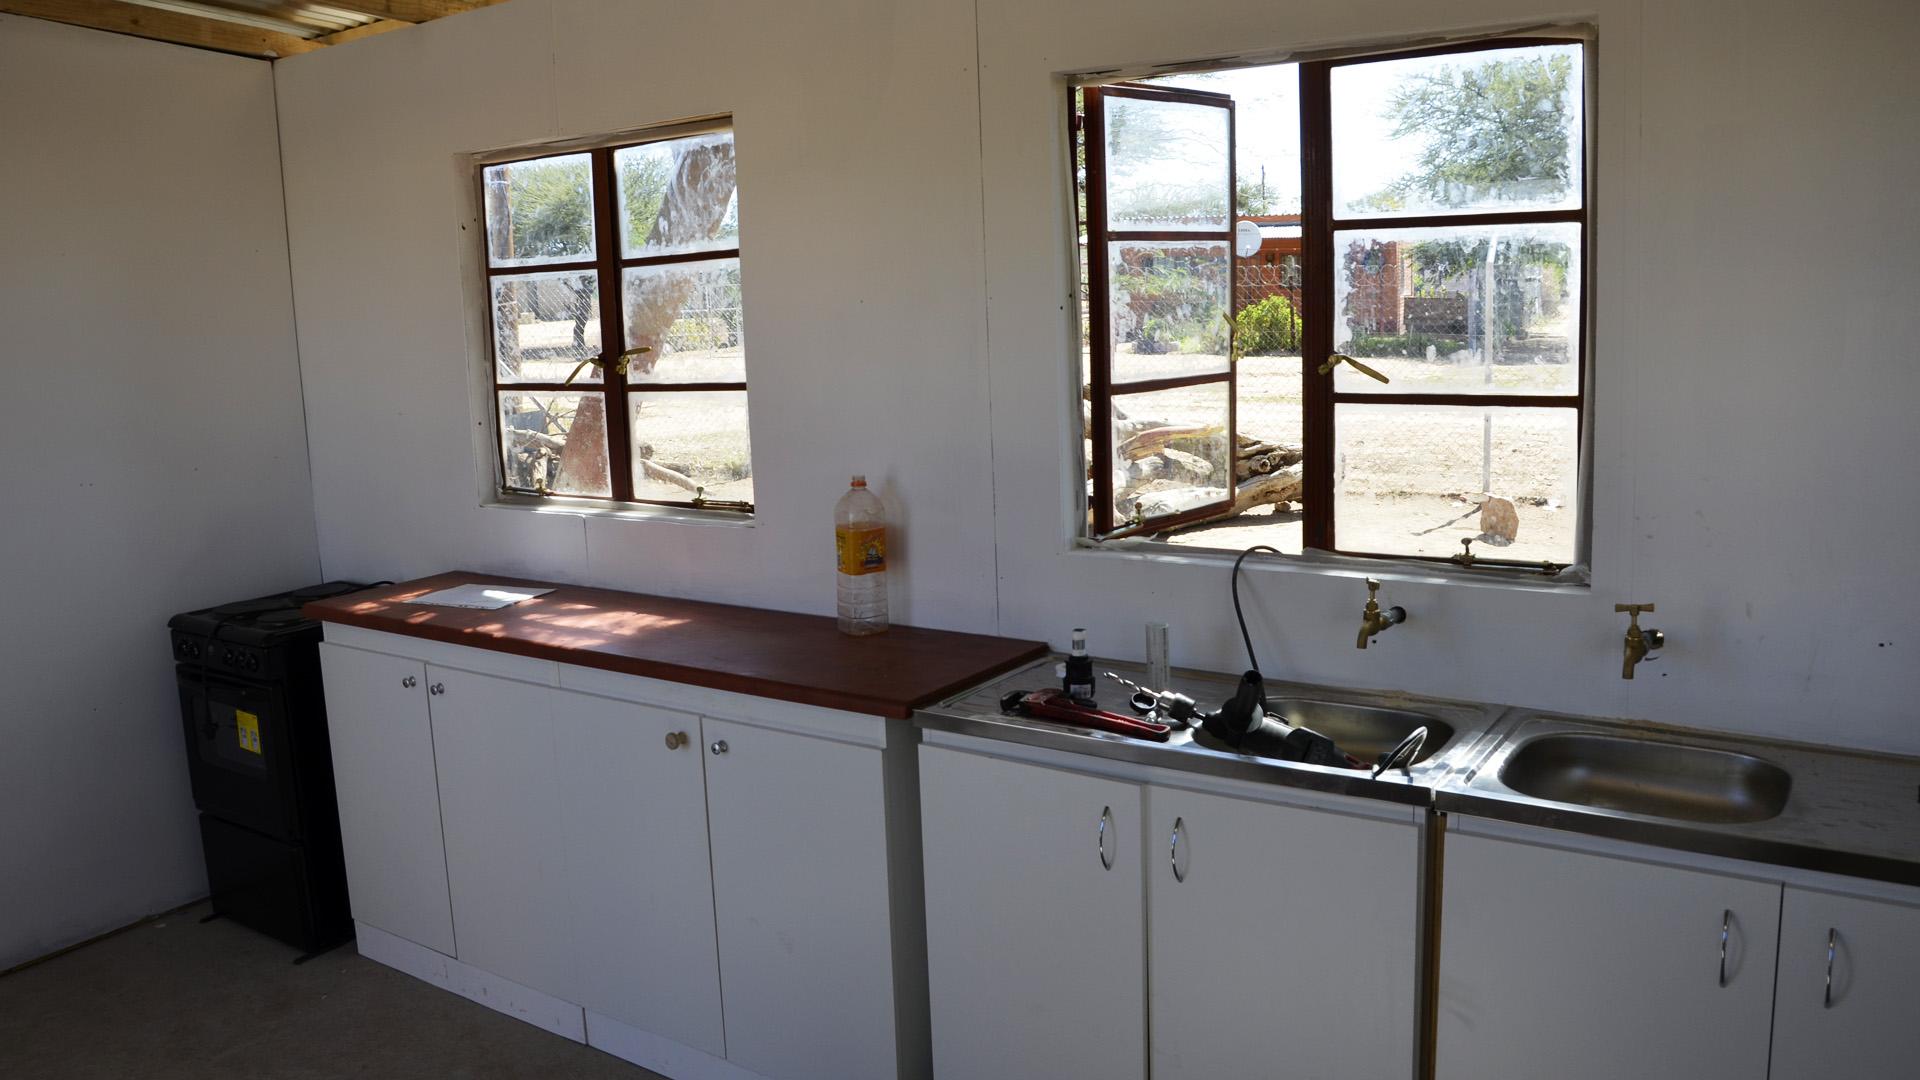 inside the schoolgarden kitchen